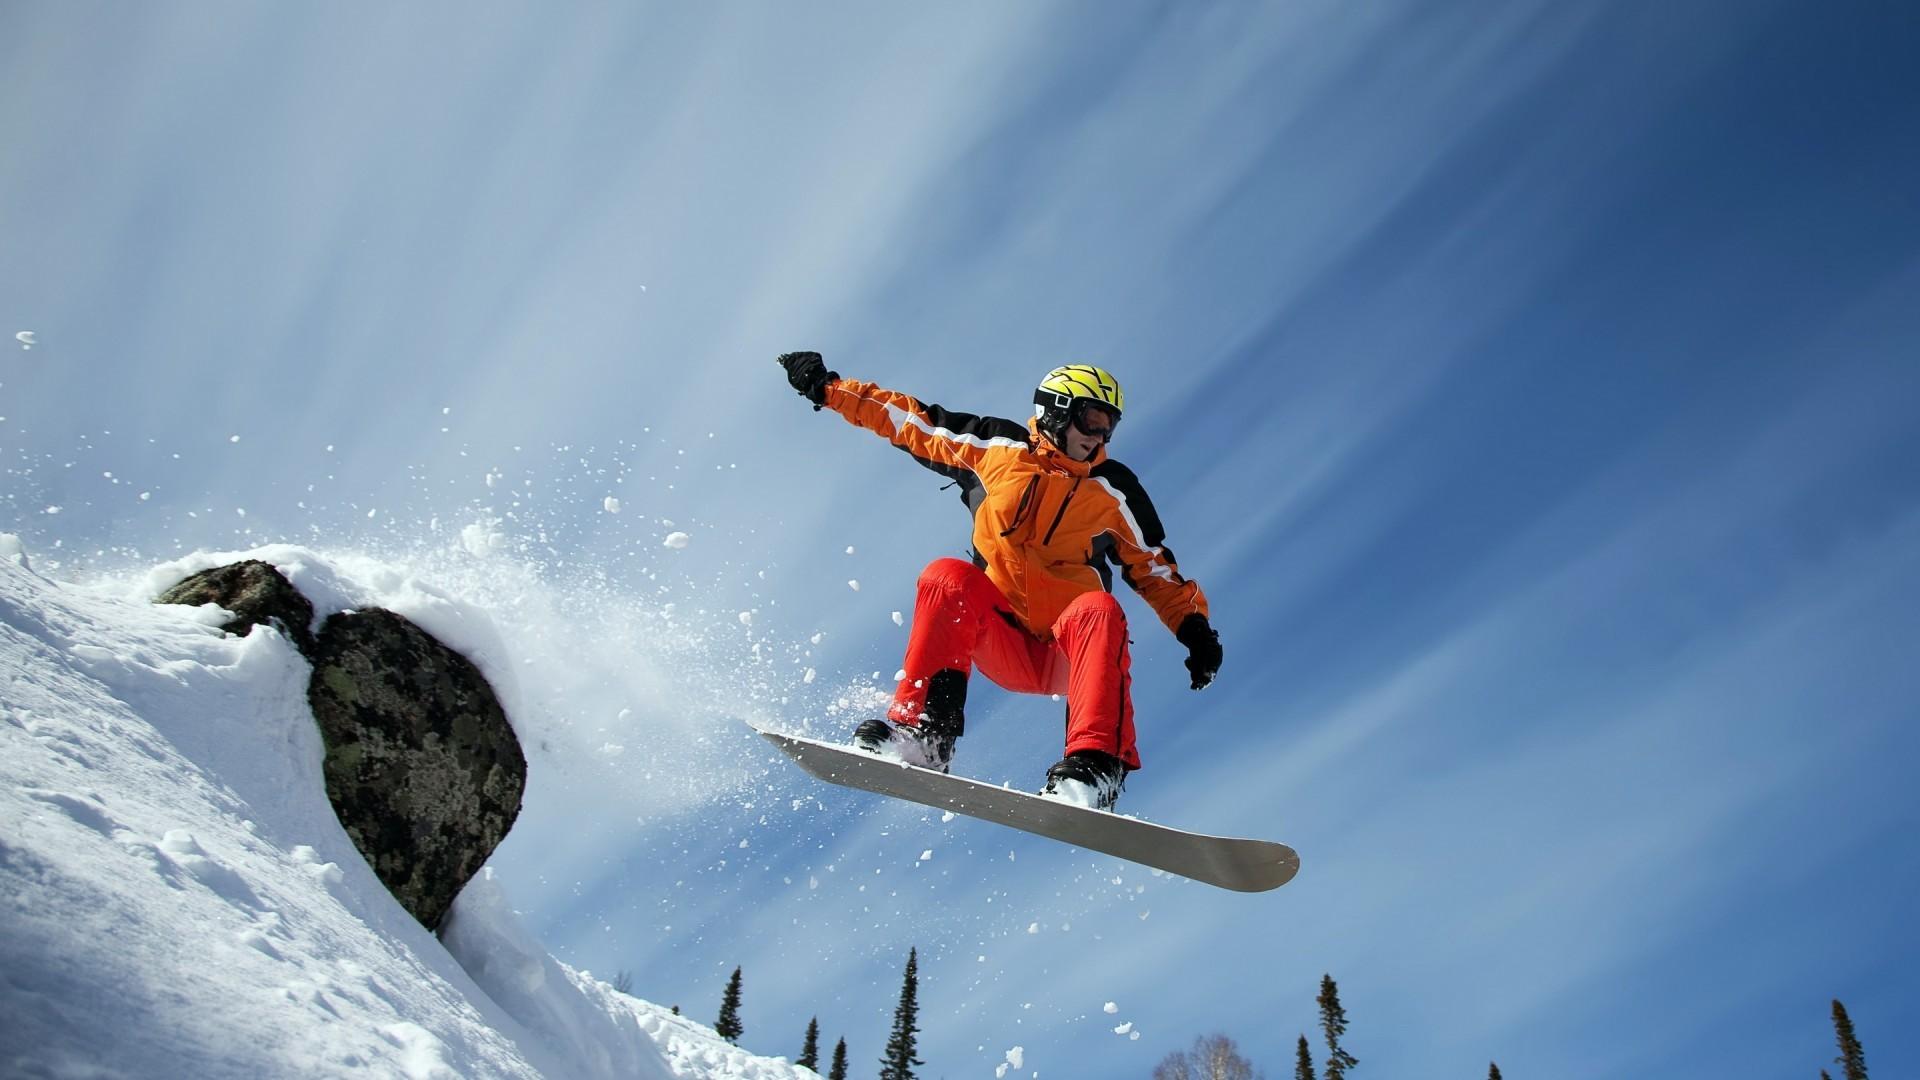 Good snowboarding wallpaper: